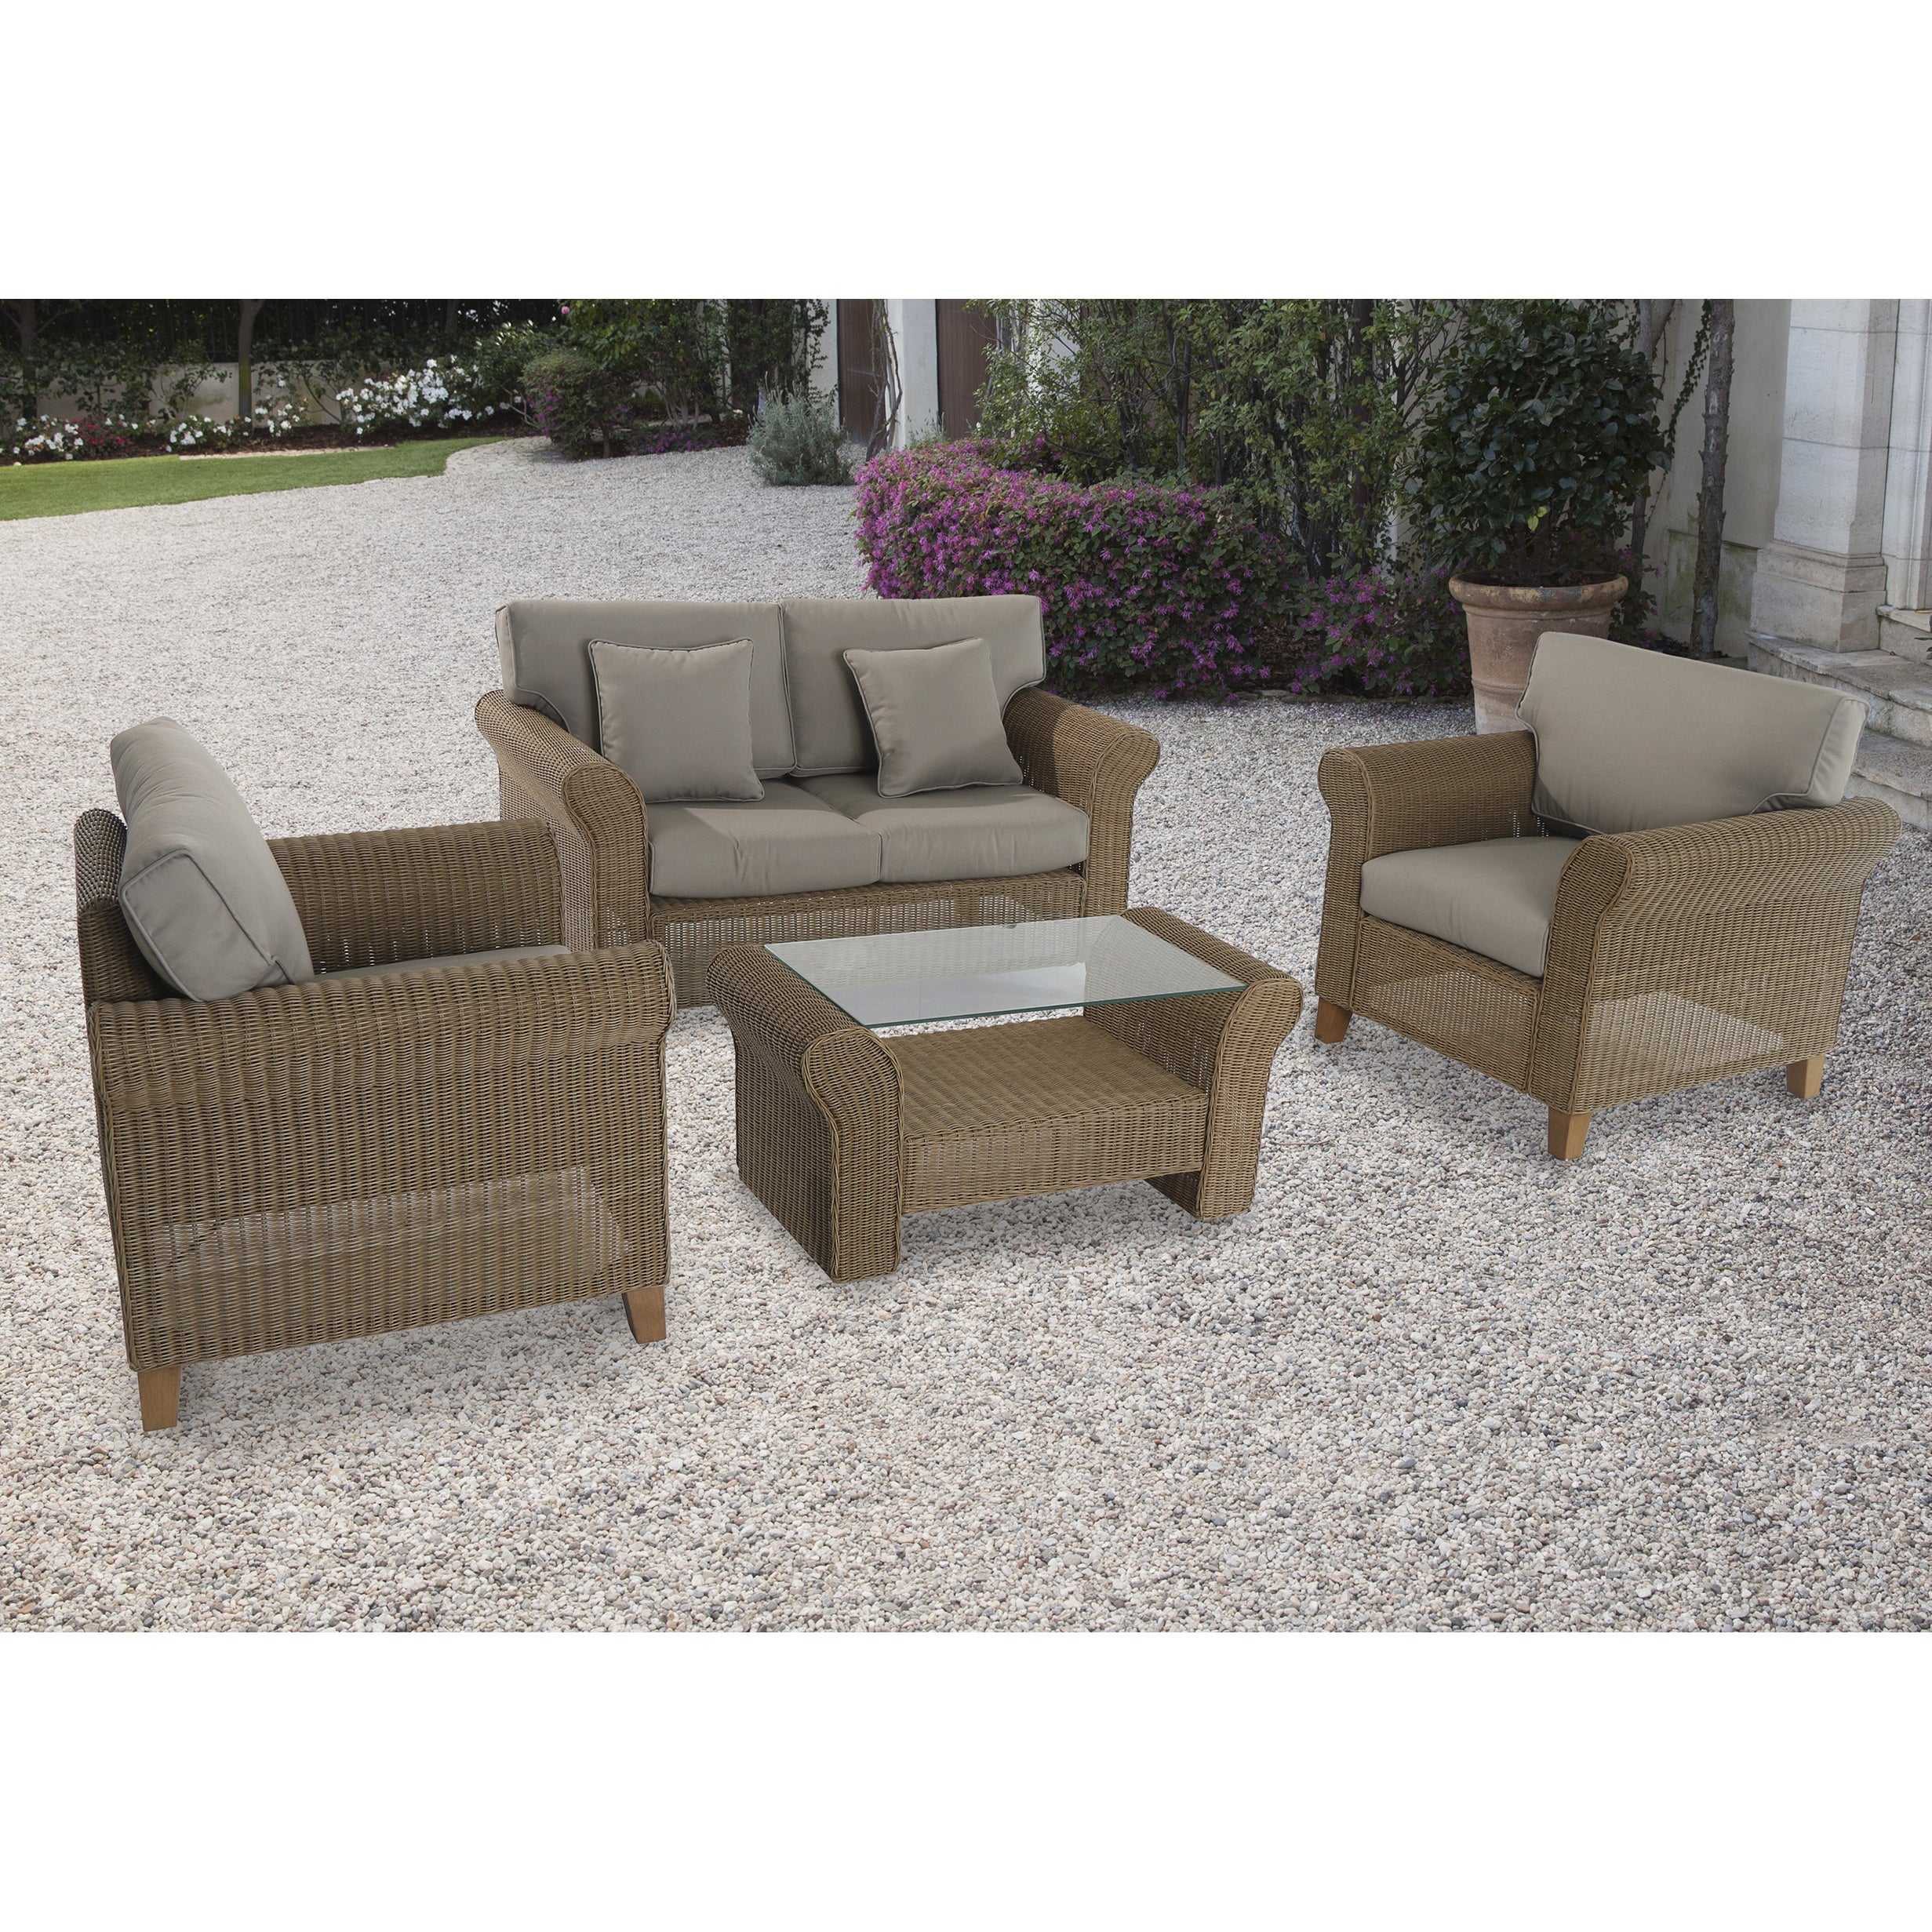 Cambridge Outdoor Avalon 4-piece Wicker Seating Set (Tan/Grey)